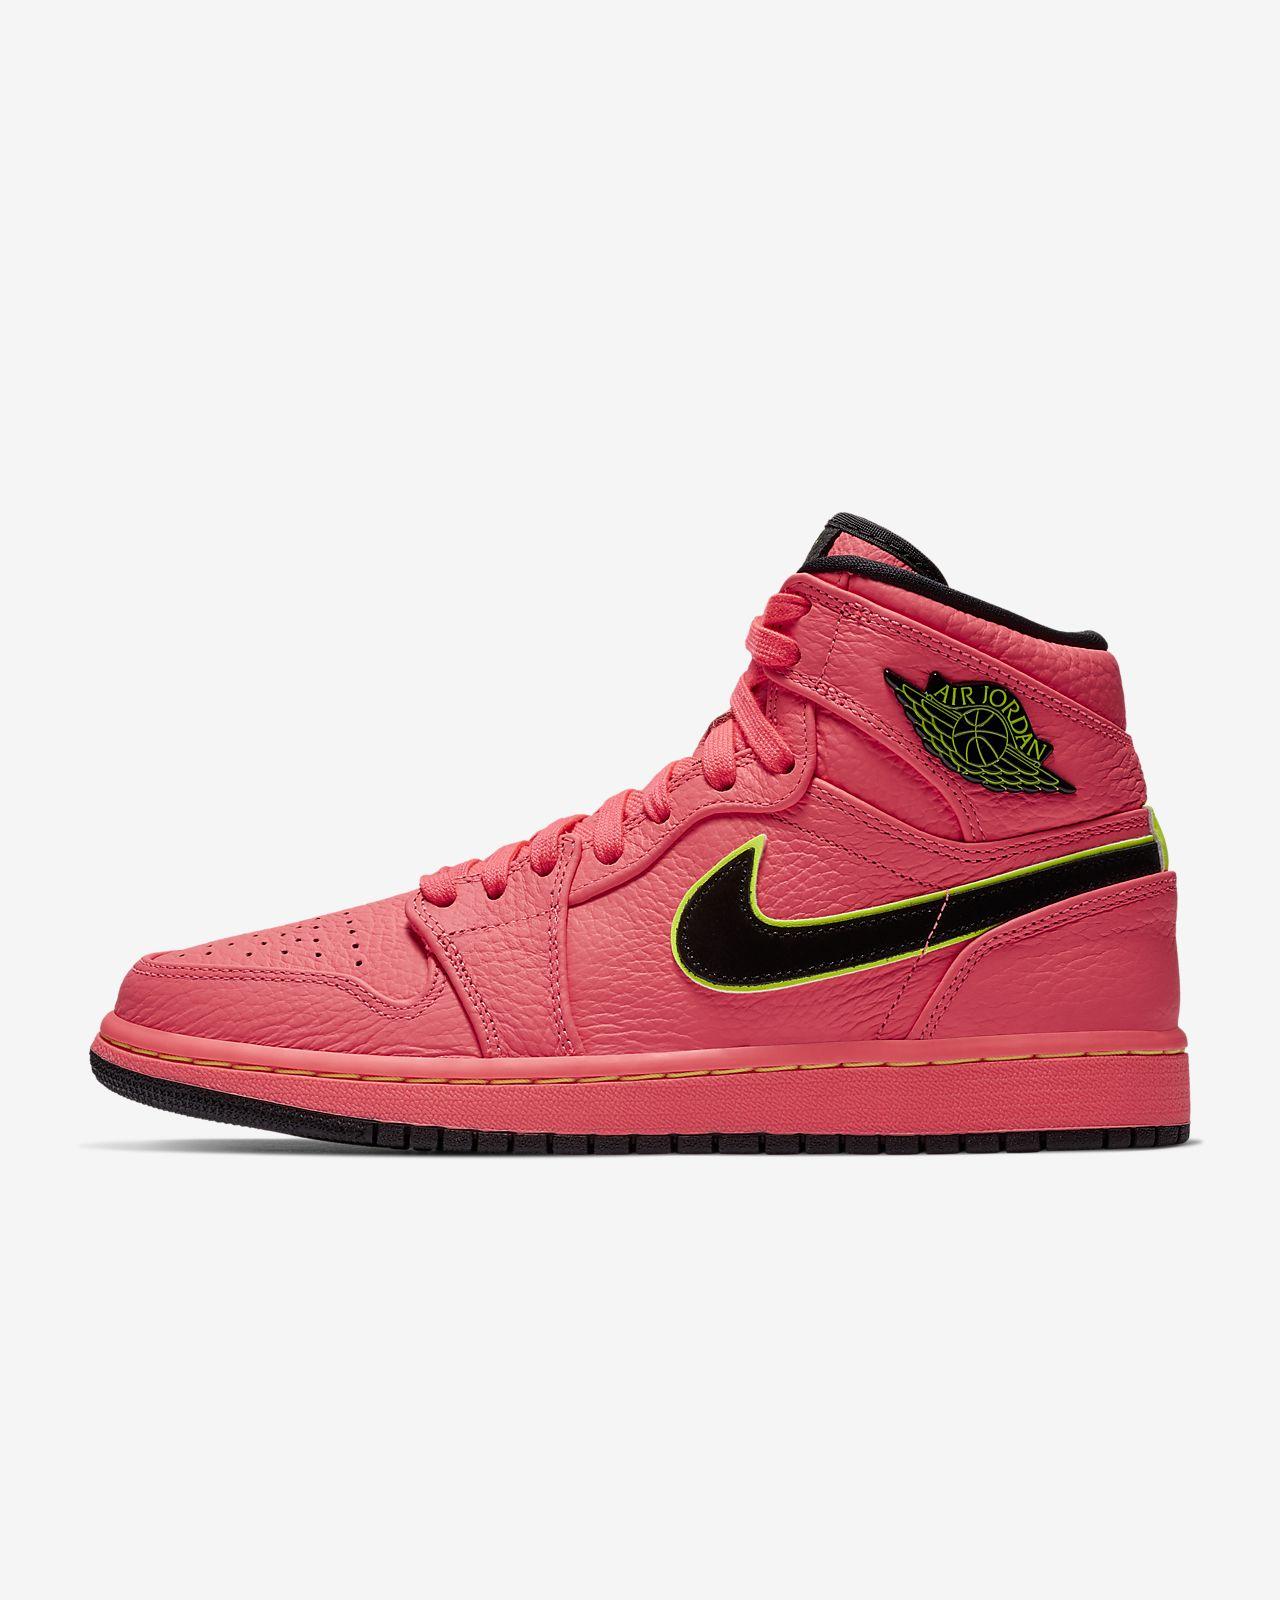 13b9af0c8caf2a Nike Air Jordan I 1 Retro Womens Shoes Nike Air Jordan 1 Retro High ...